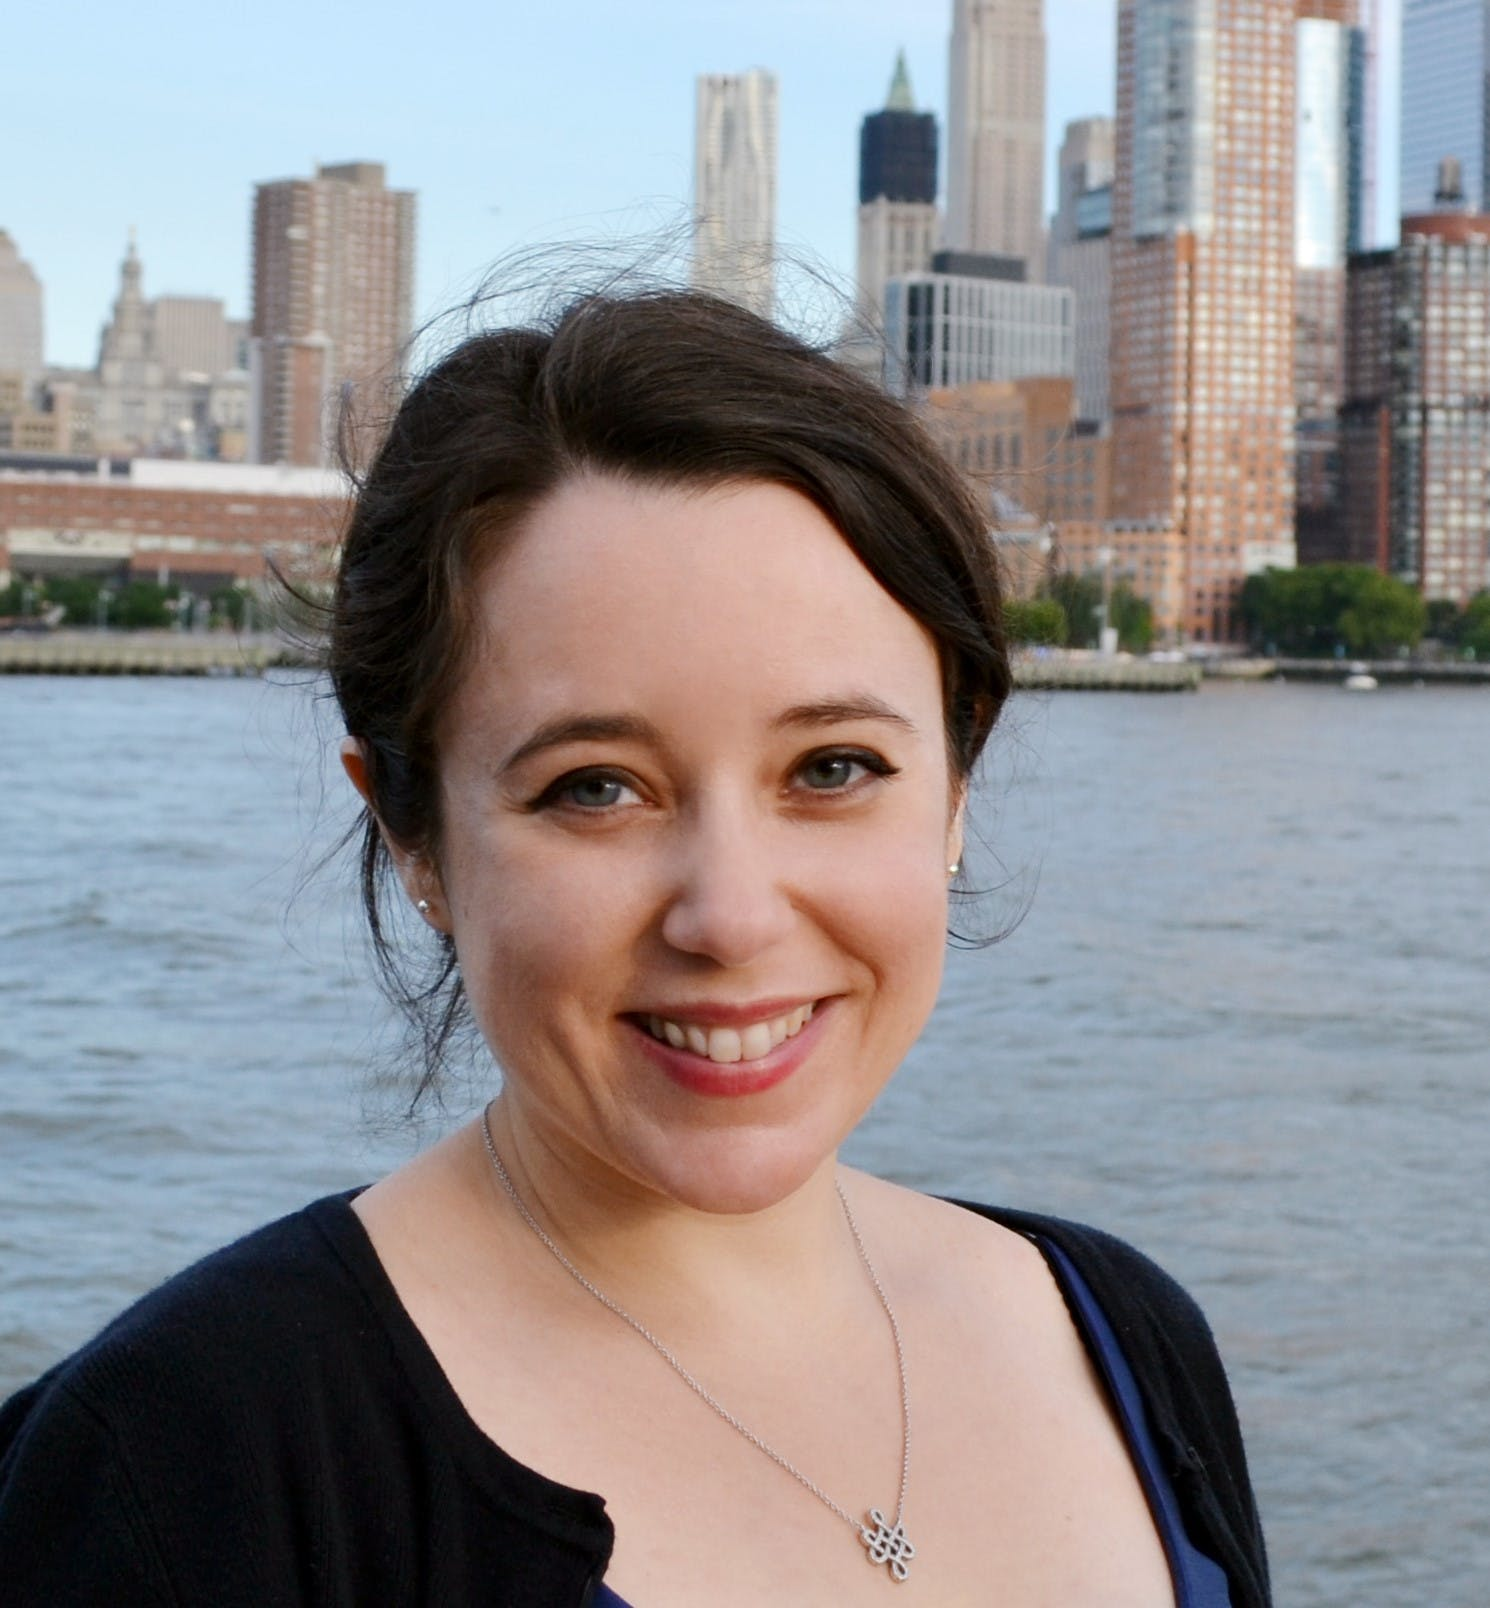 Lisa Tagliaferri